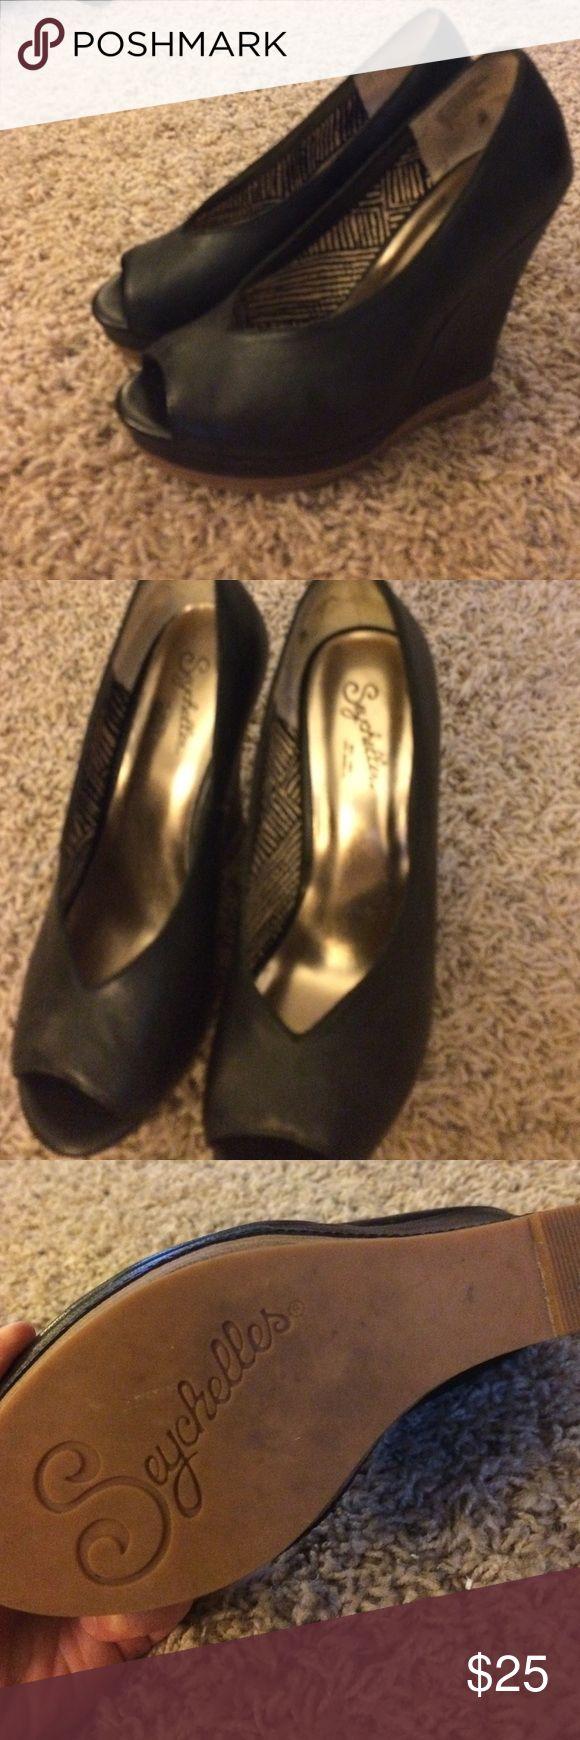 Black leather peep toe wedge Seychelles black leather peep toe wedge. Very comfortable. Like new Seychelles Shoes Heels